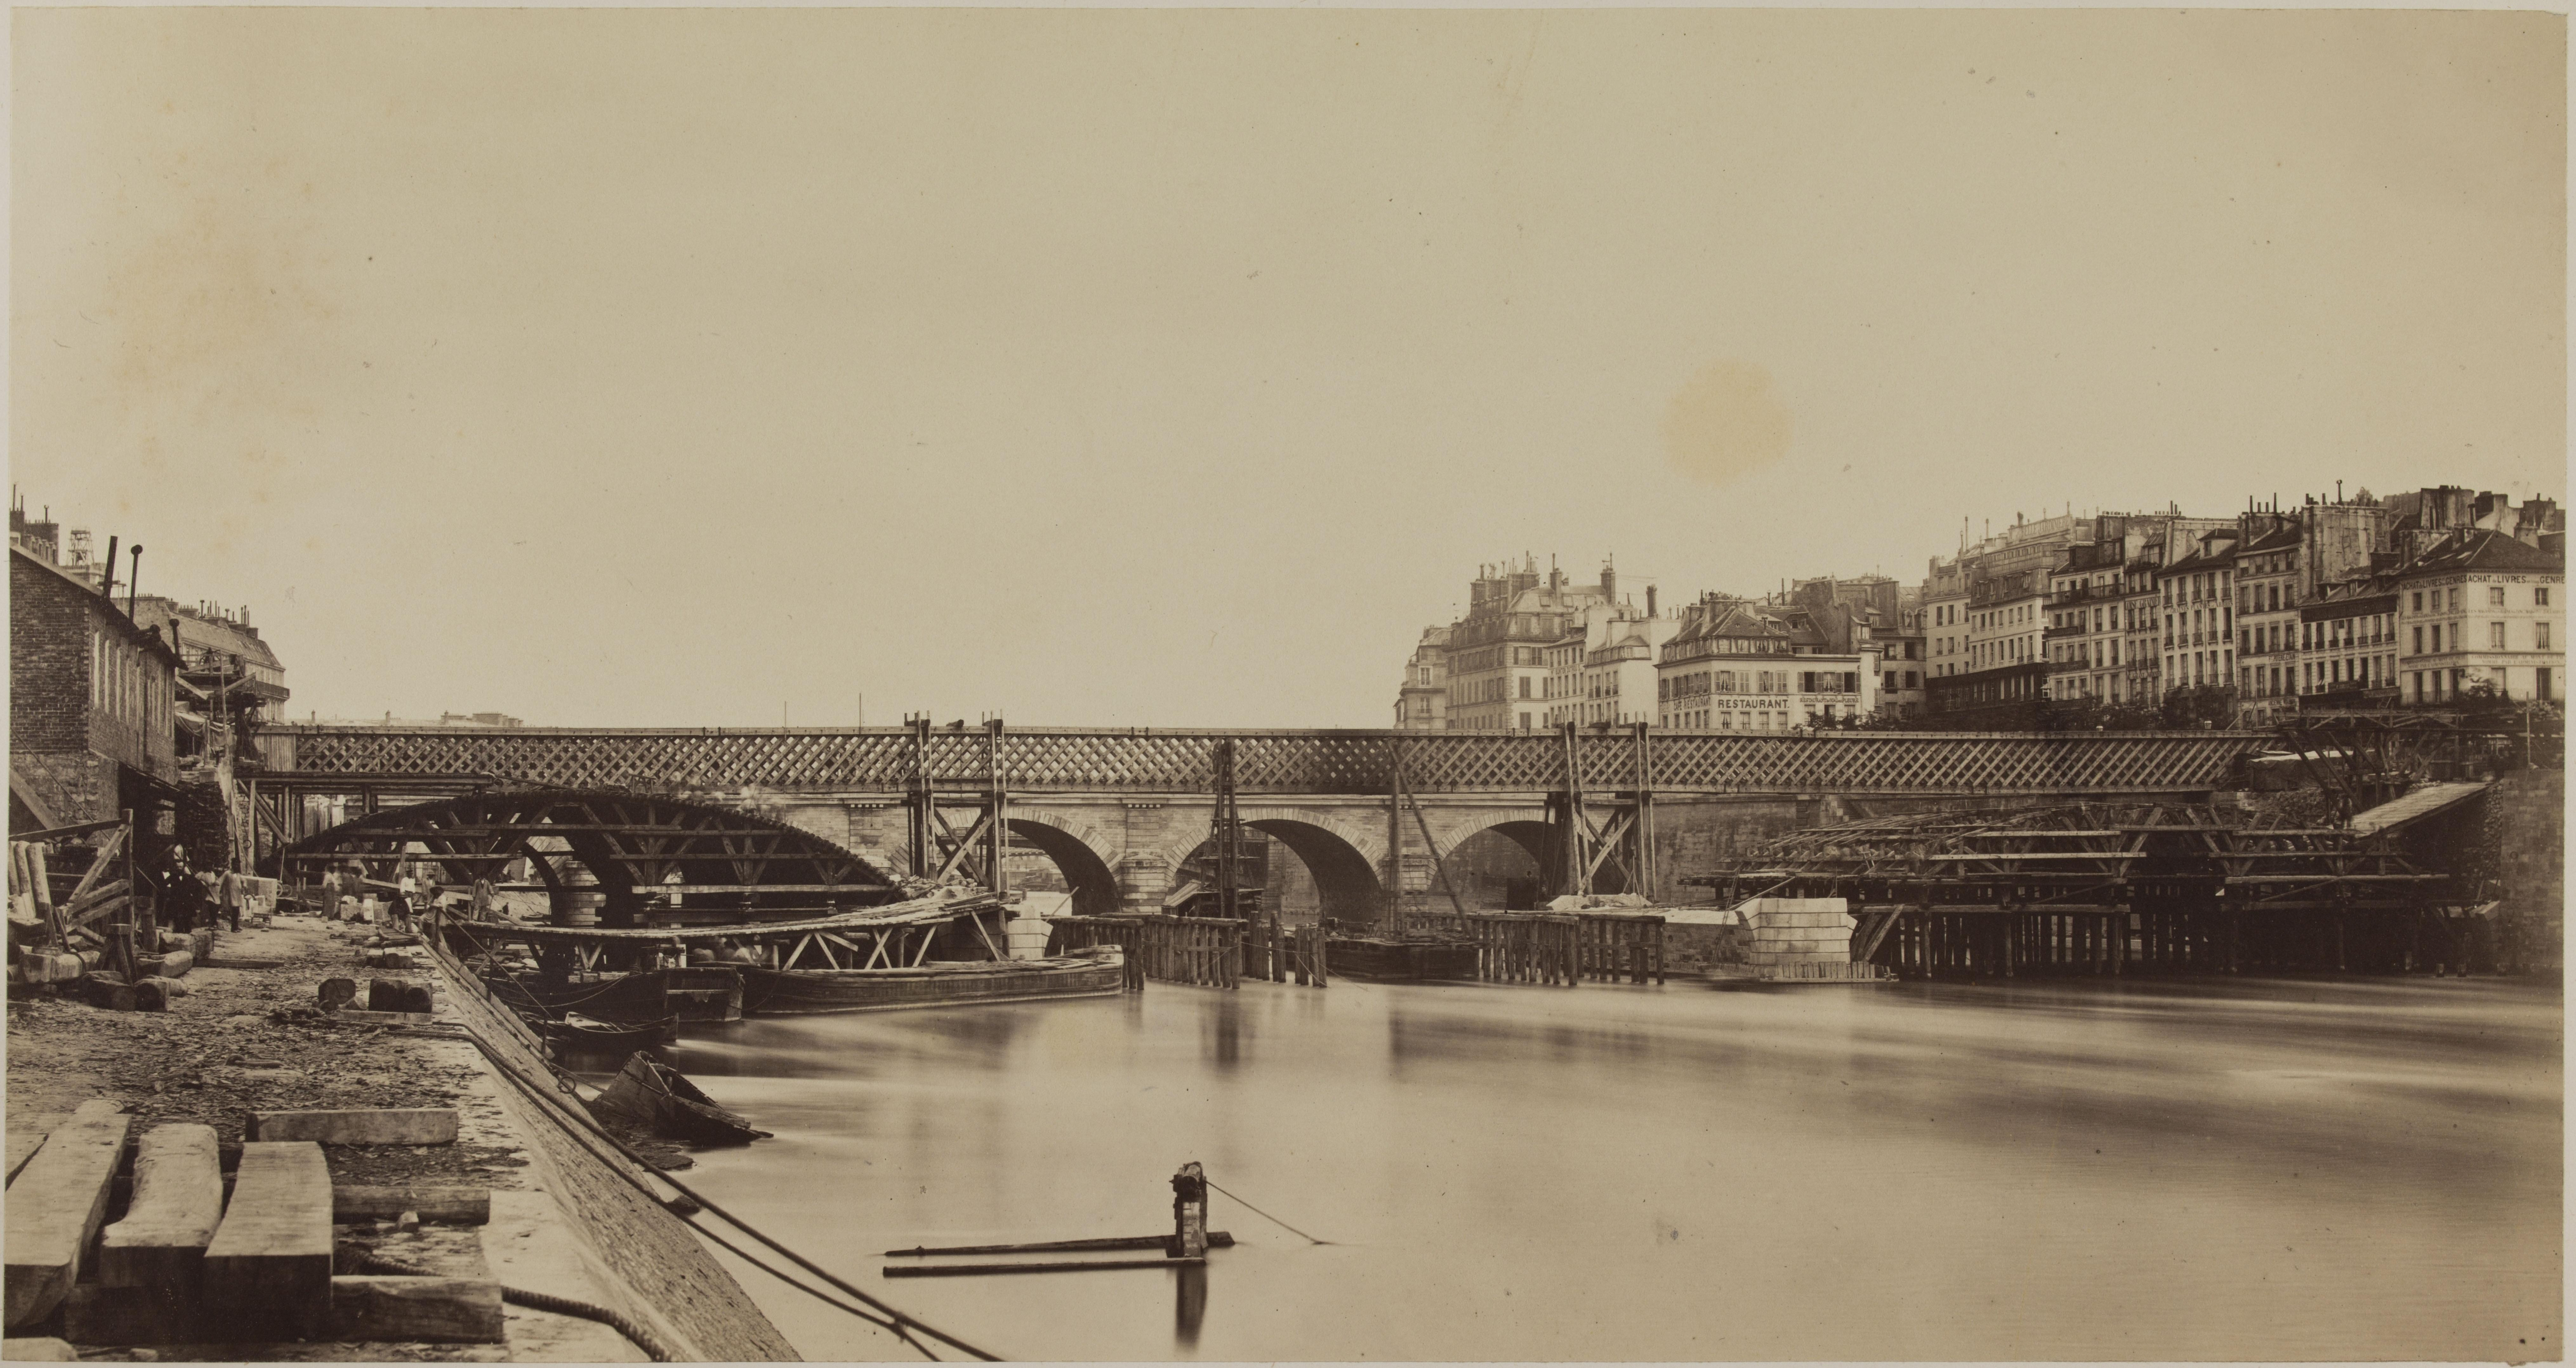 05. Подъем арок моста